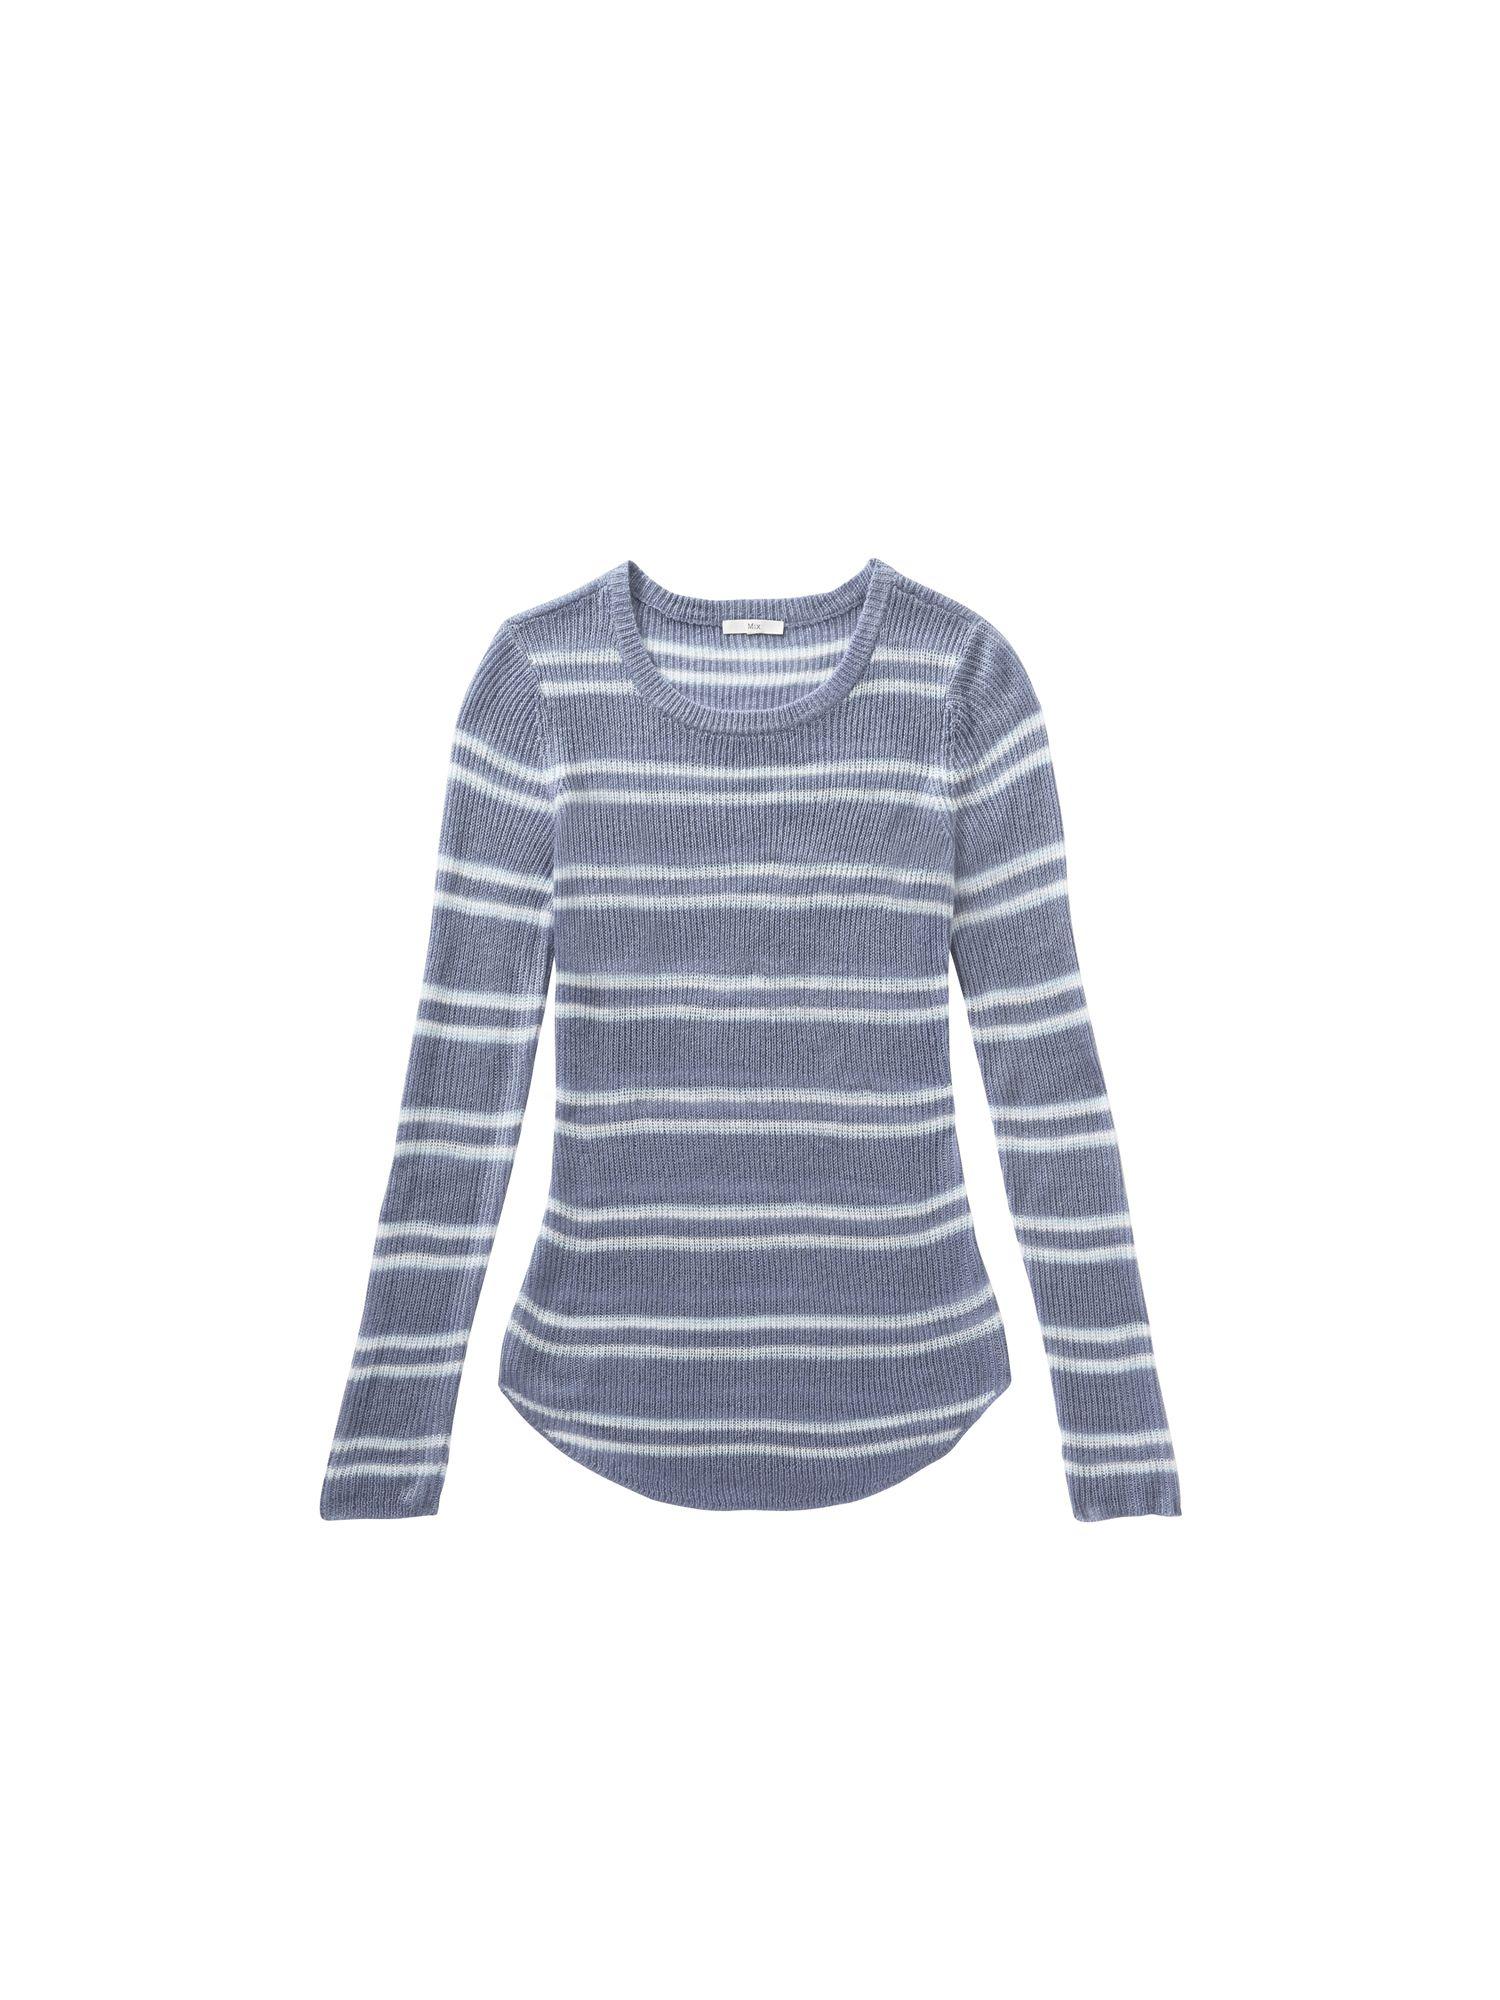 Mix Apparel - Collection - Stripe Lightweight Jumper